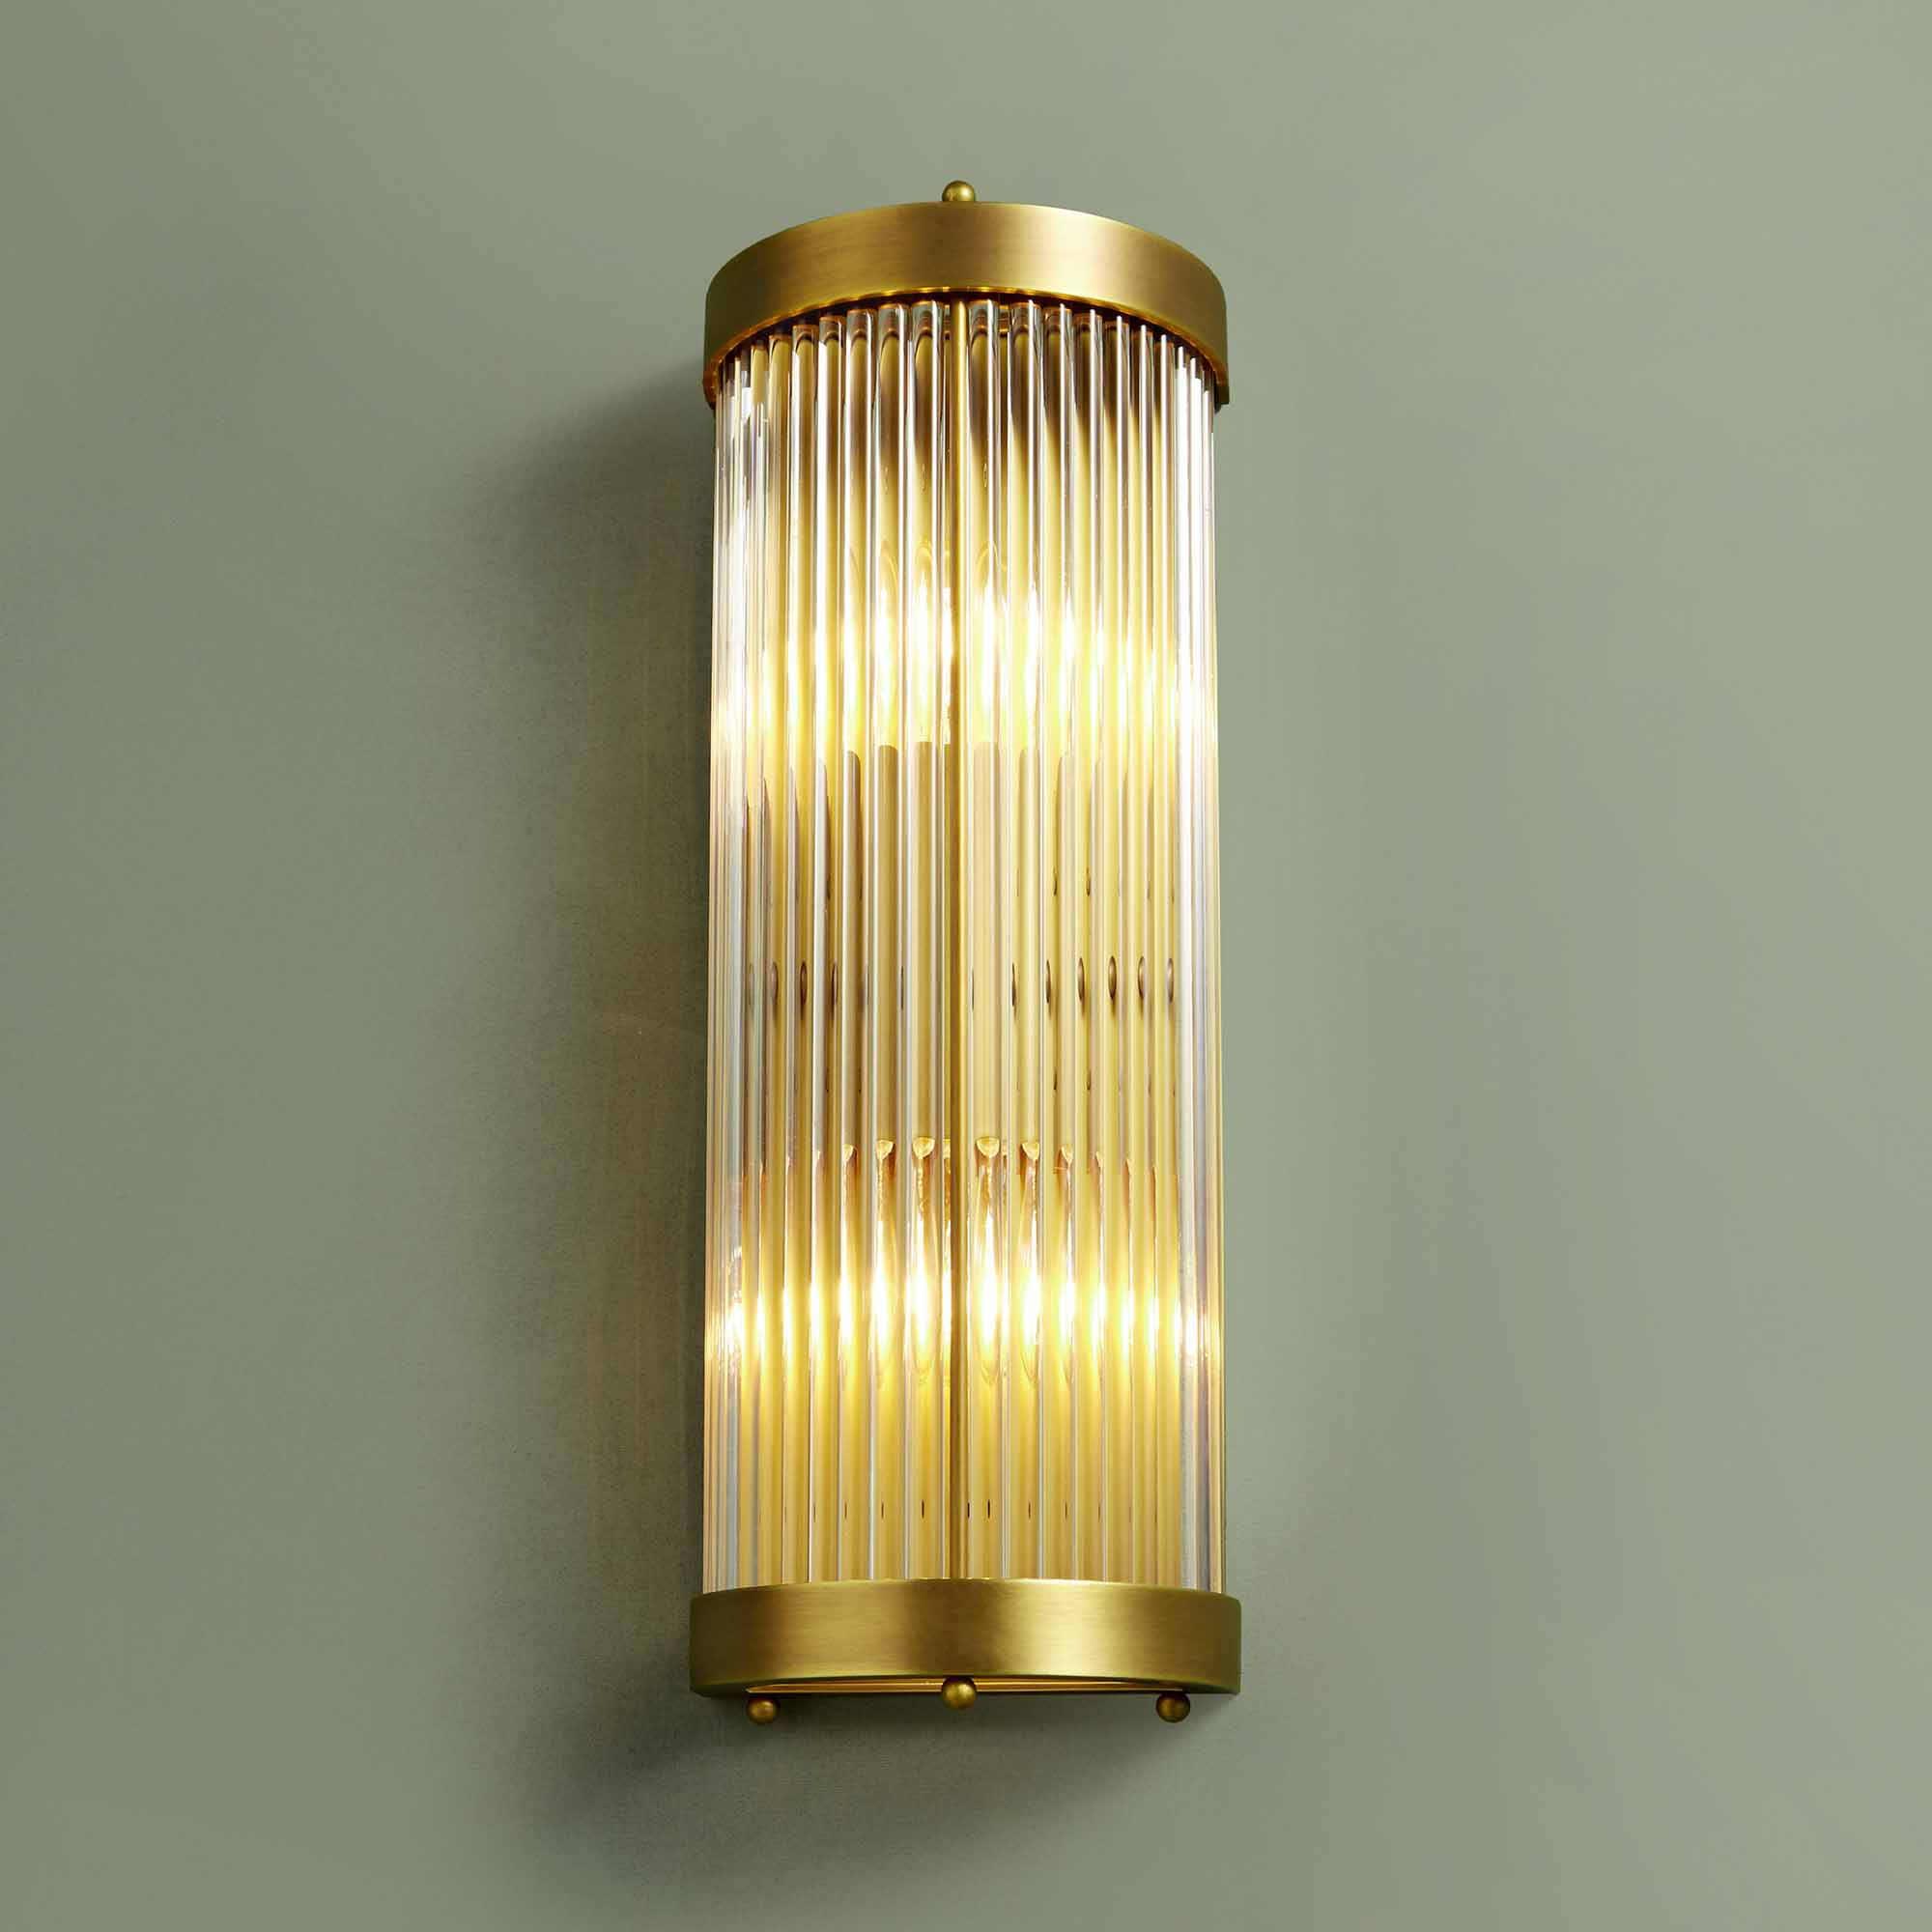 10 Reasons For The Brass Bathroom Wall Lights Warisan Lighting